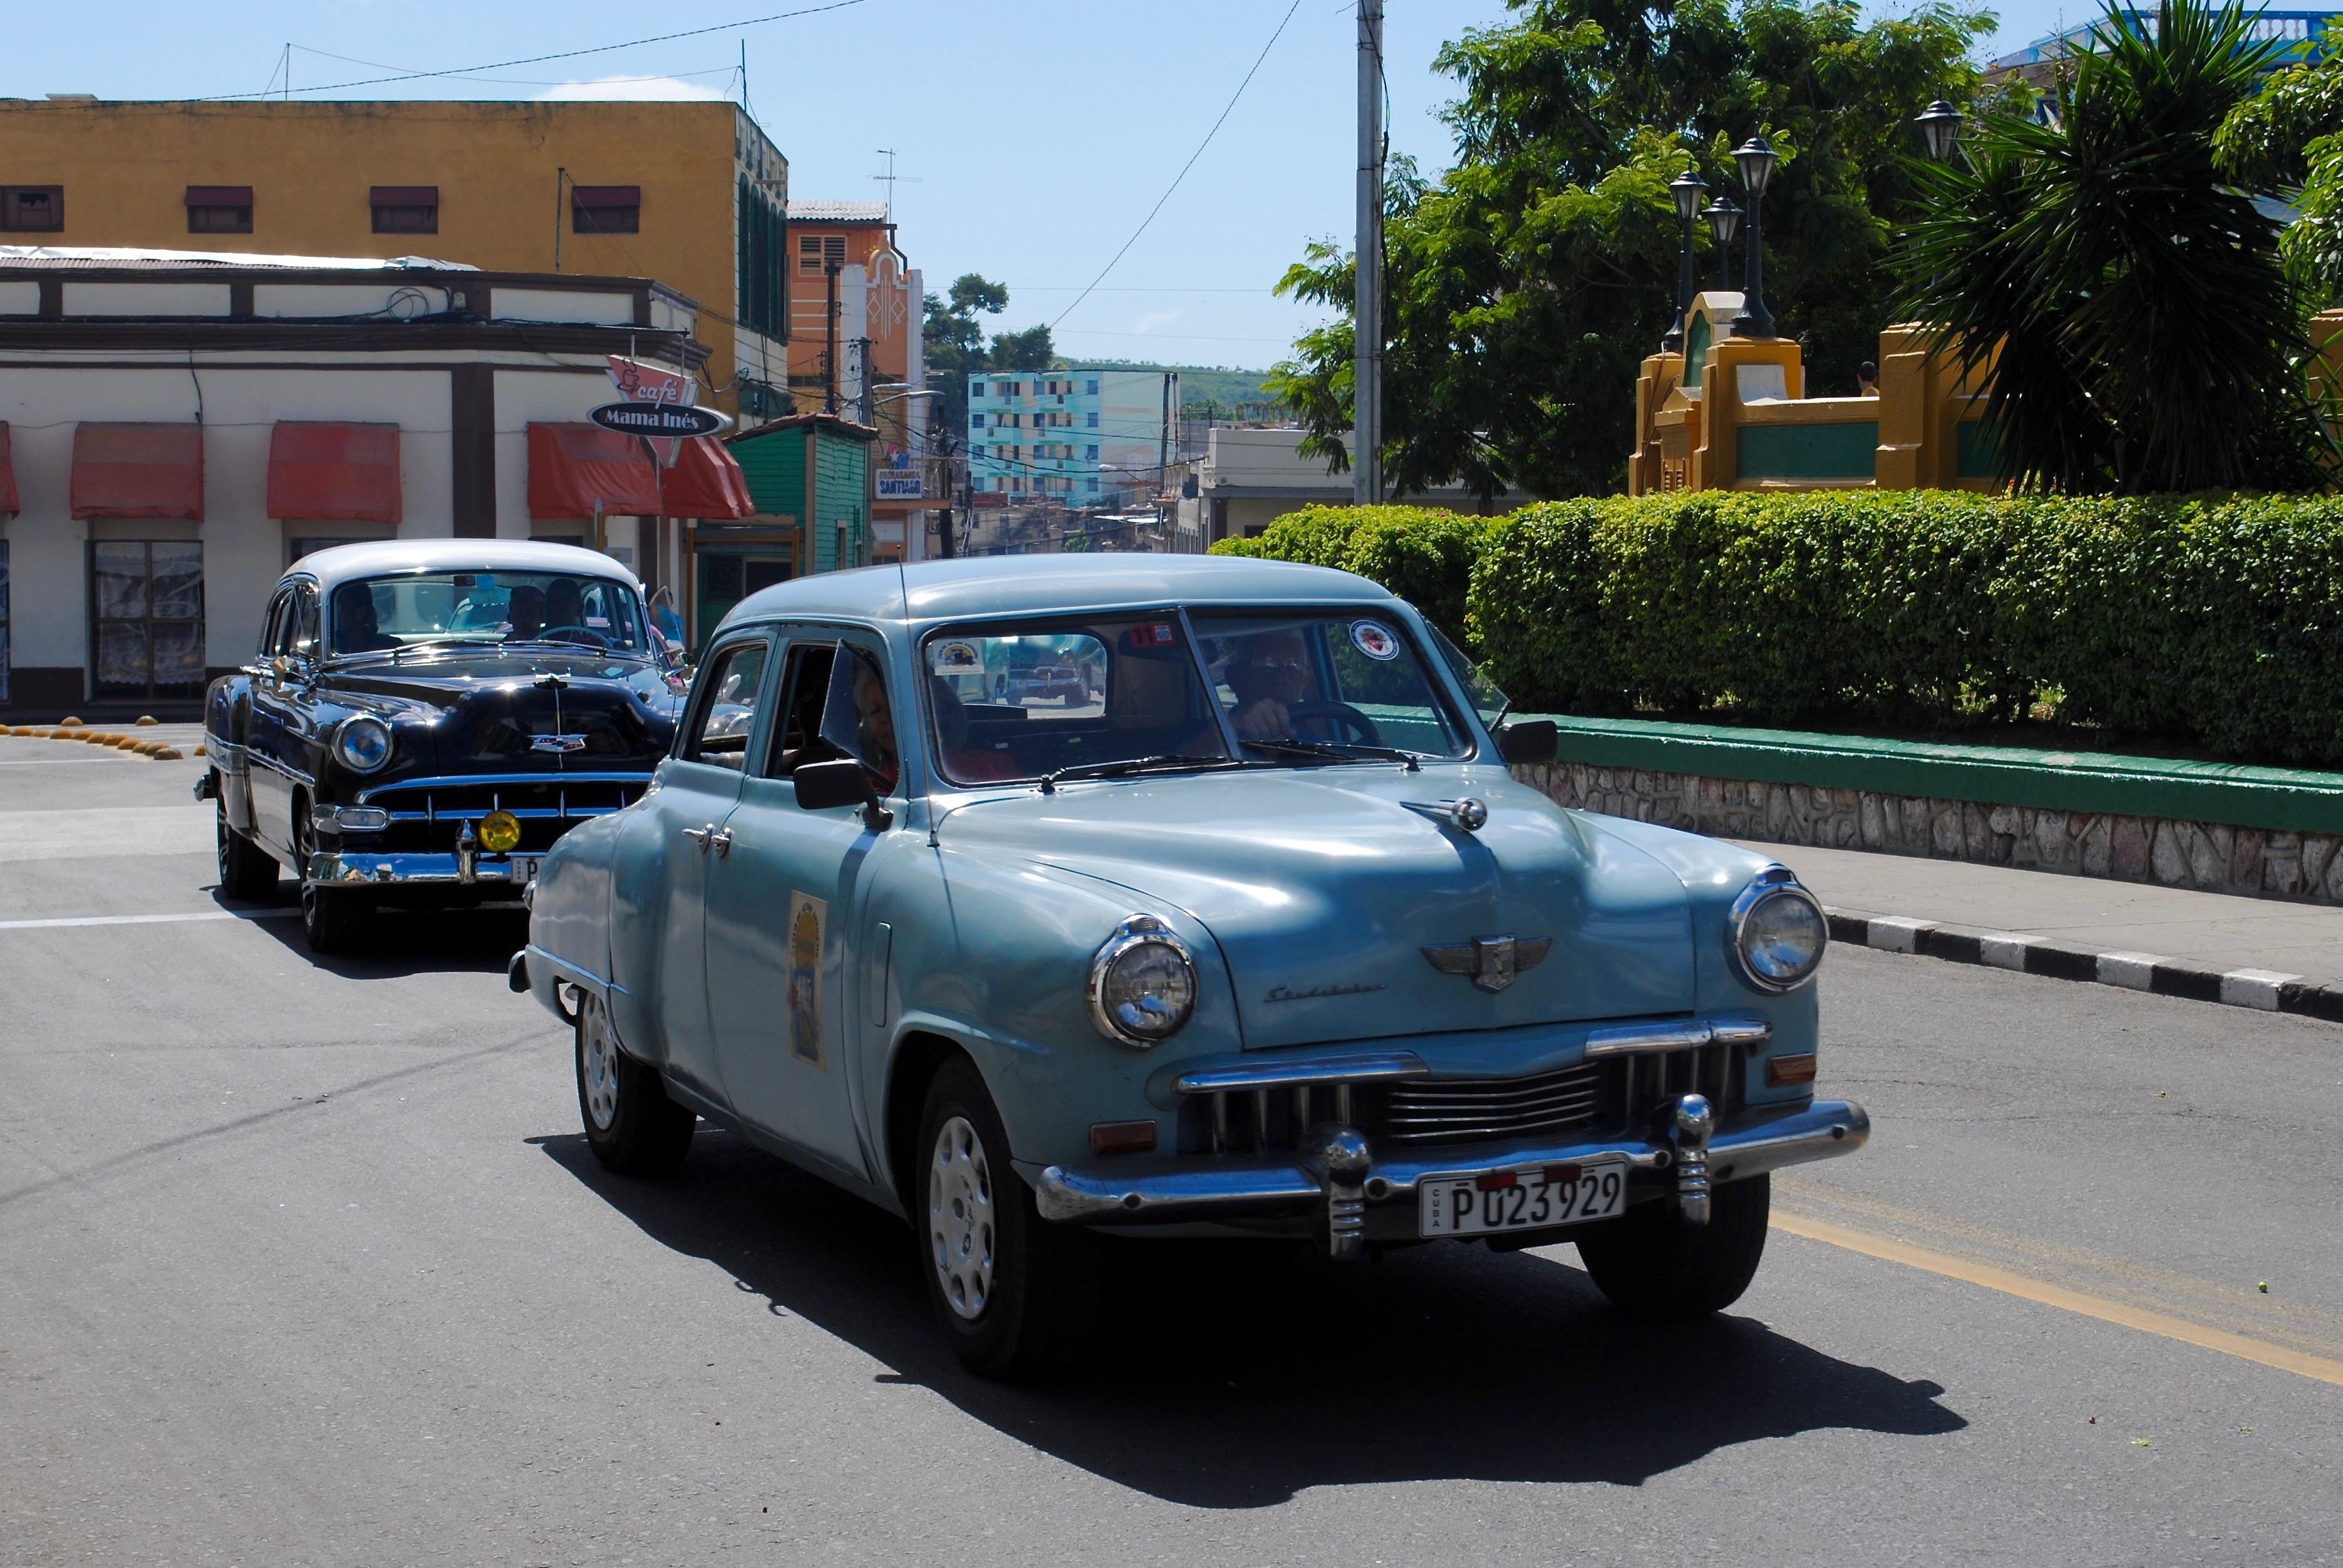 Free Images : street, retro, taxi, transportation, transport, drive ...